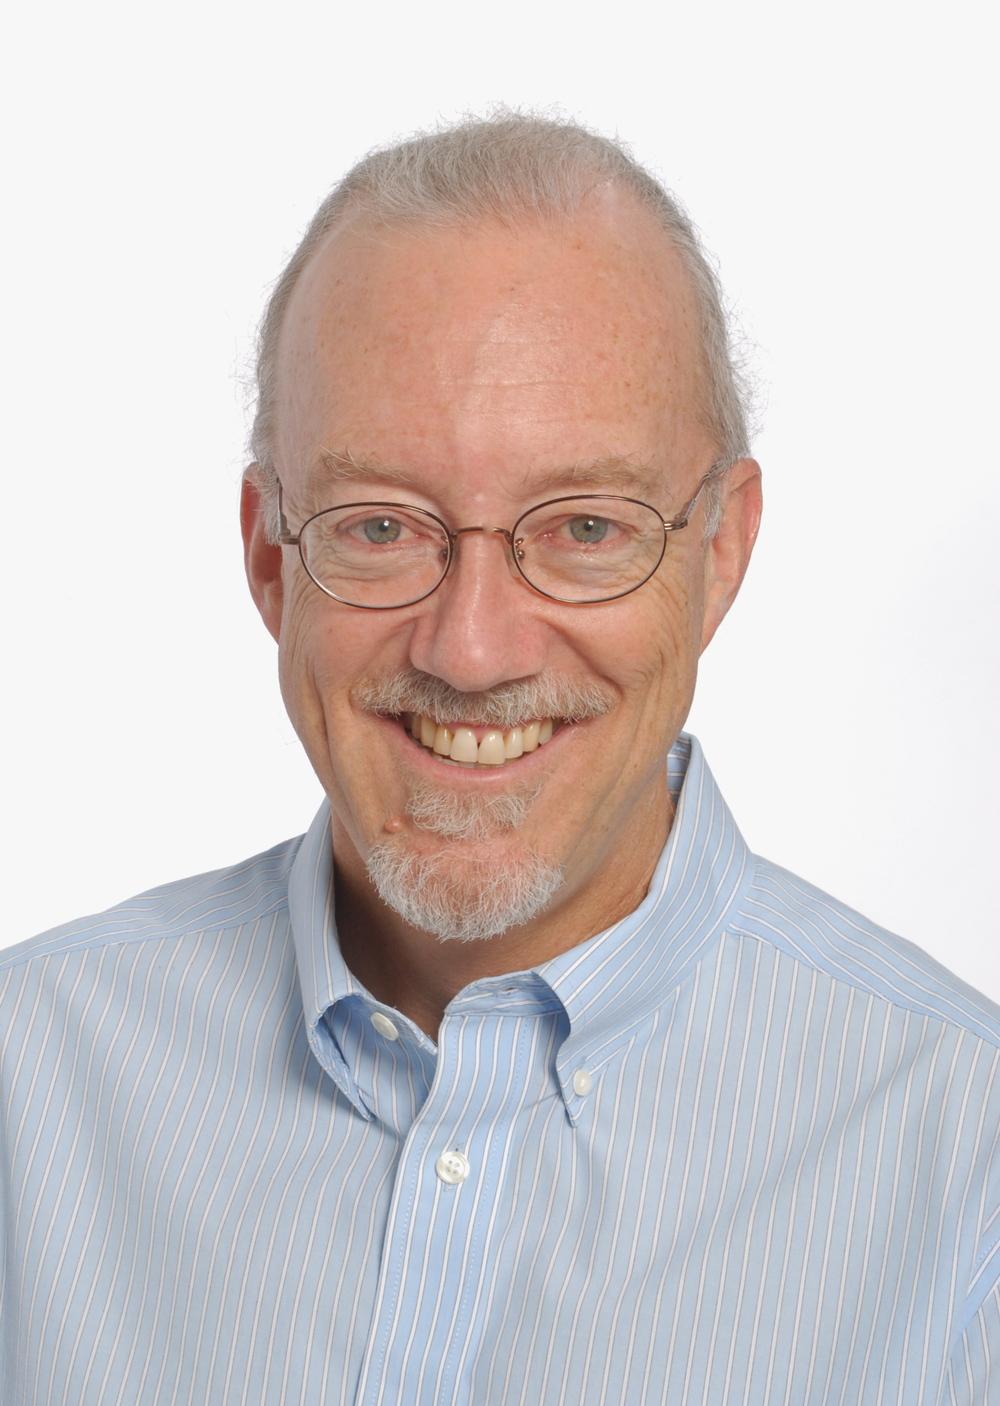 Mark G. Rowan